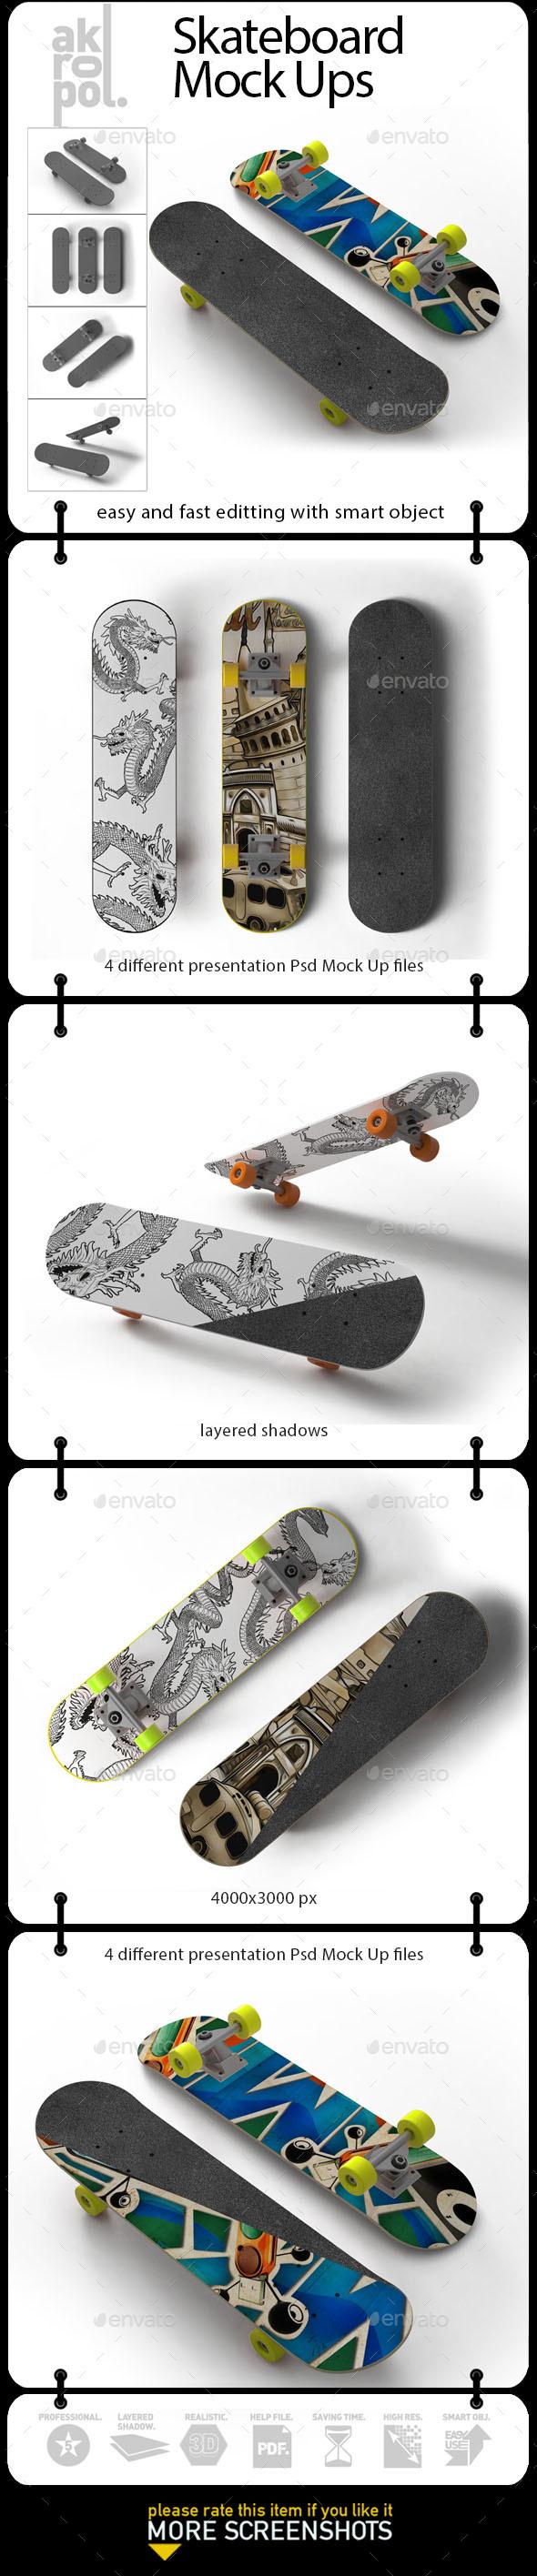 Skateboard Mock-Up - Product Mock-Ups Graphics